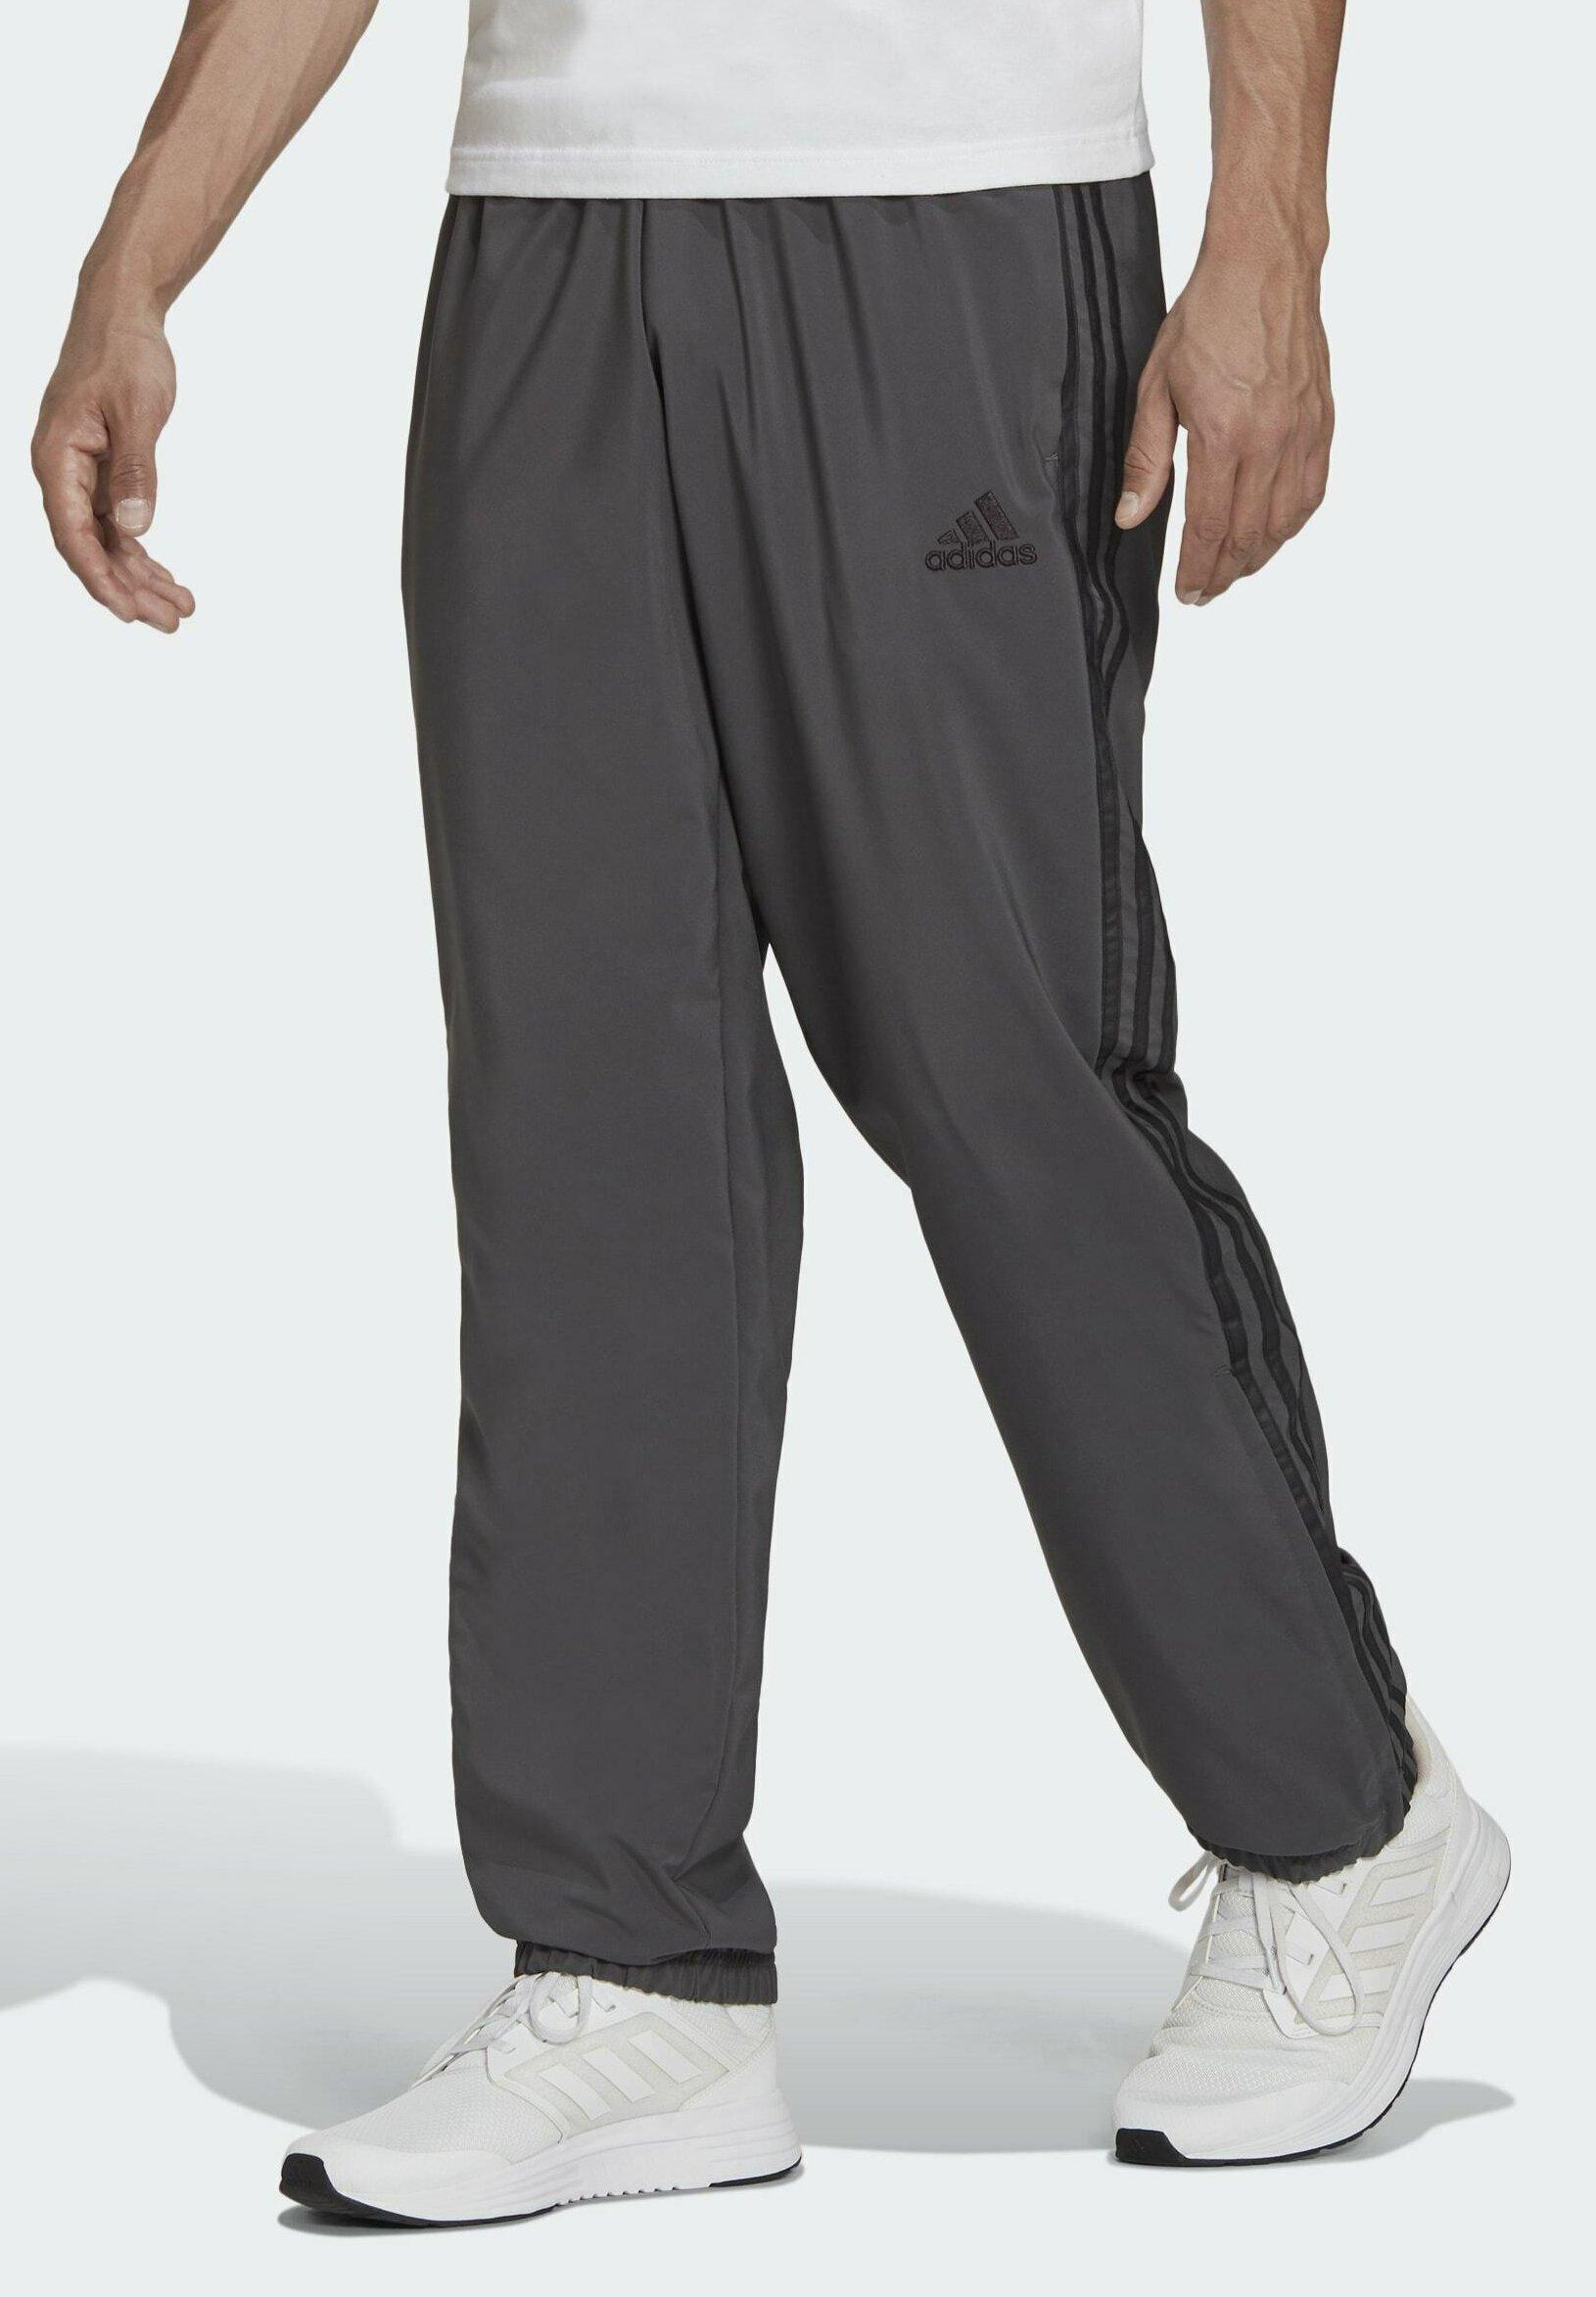 Homme AEROREADY SAMSON - Pantalon de survêtement